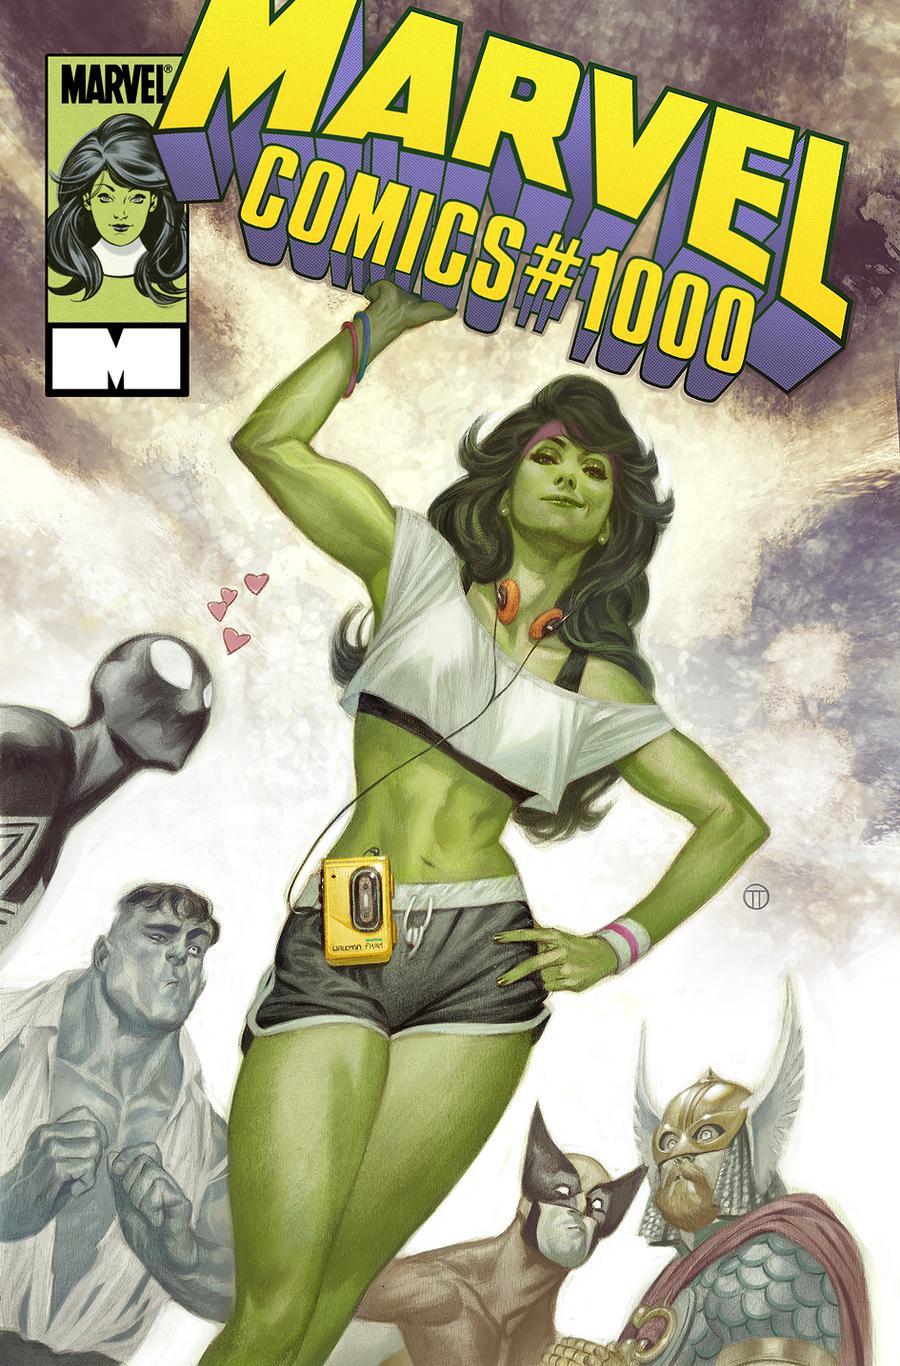 Blank Variant Cover Marvel Comics #1000 Comic Book